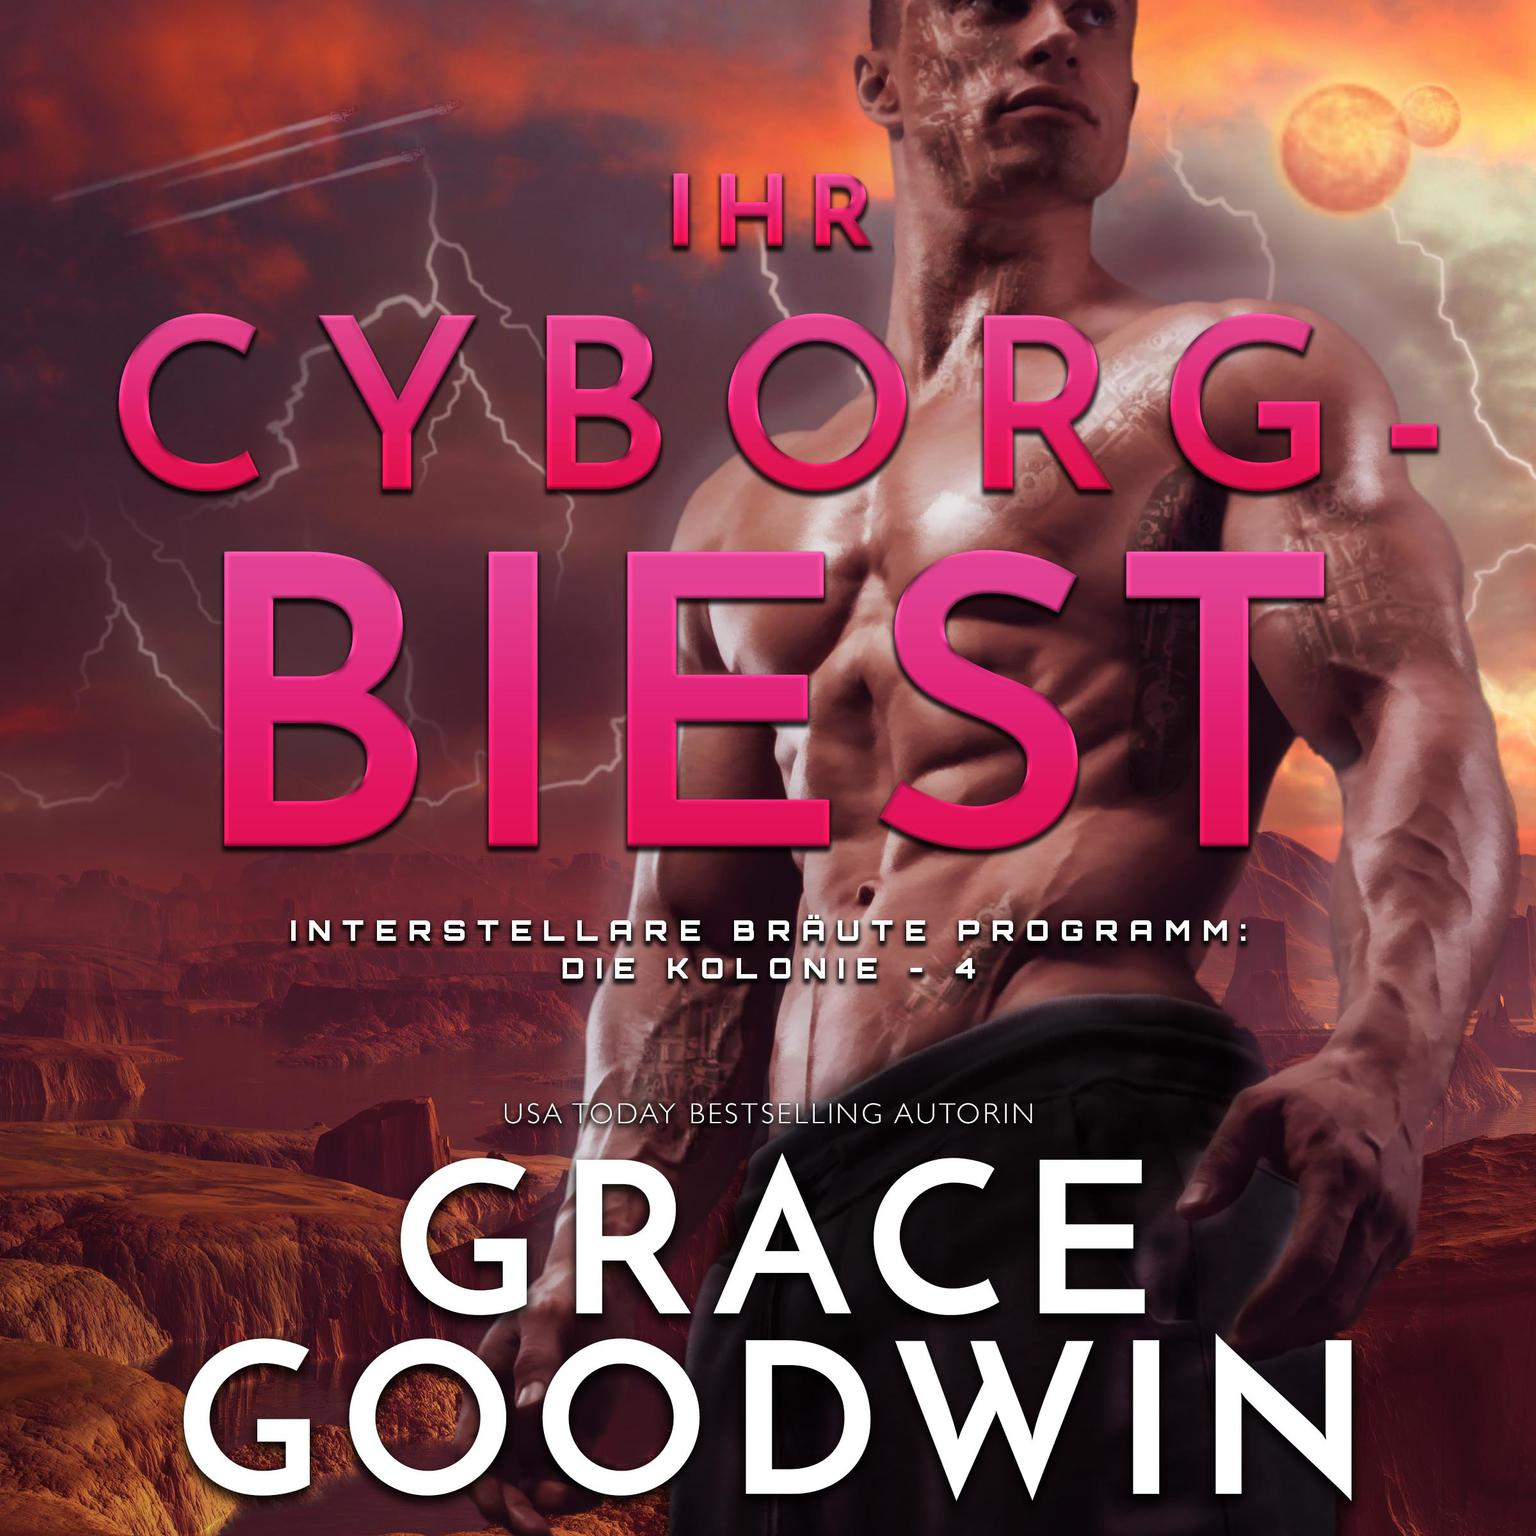 Ihr Cyborg-Biest Audiobook, by Grace Goodwin